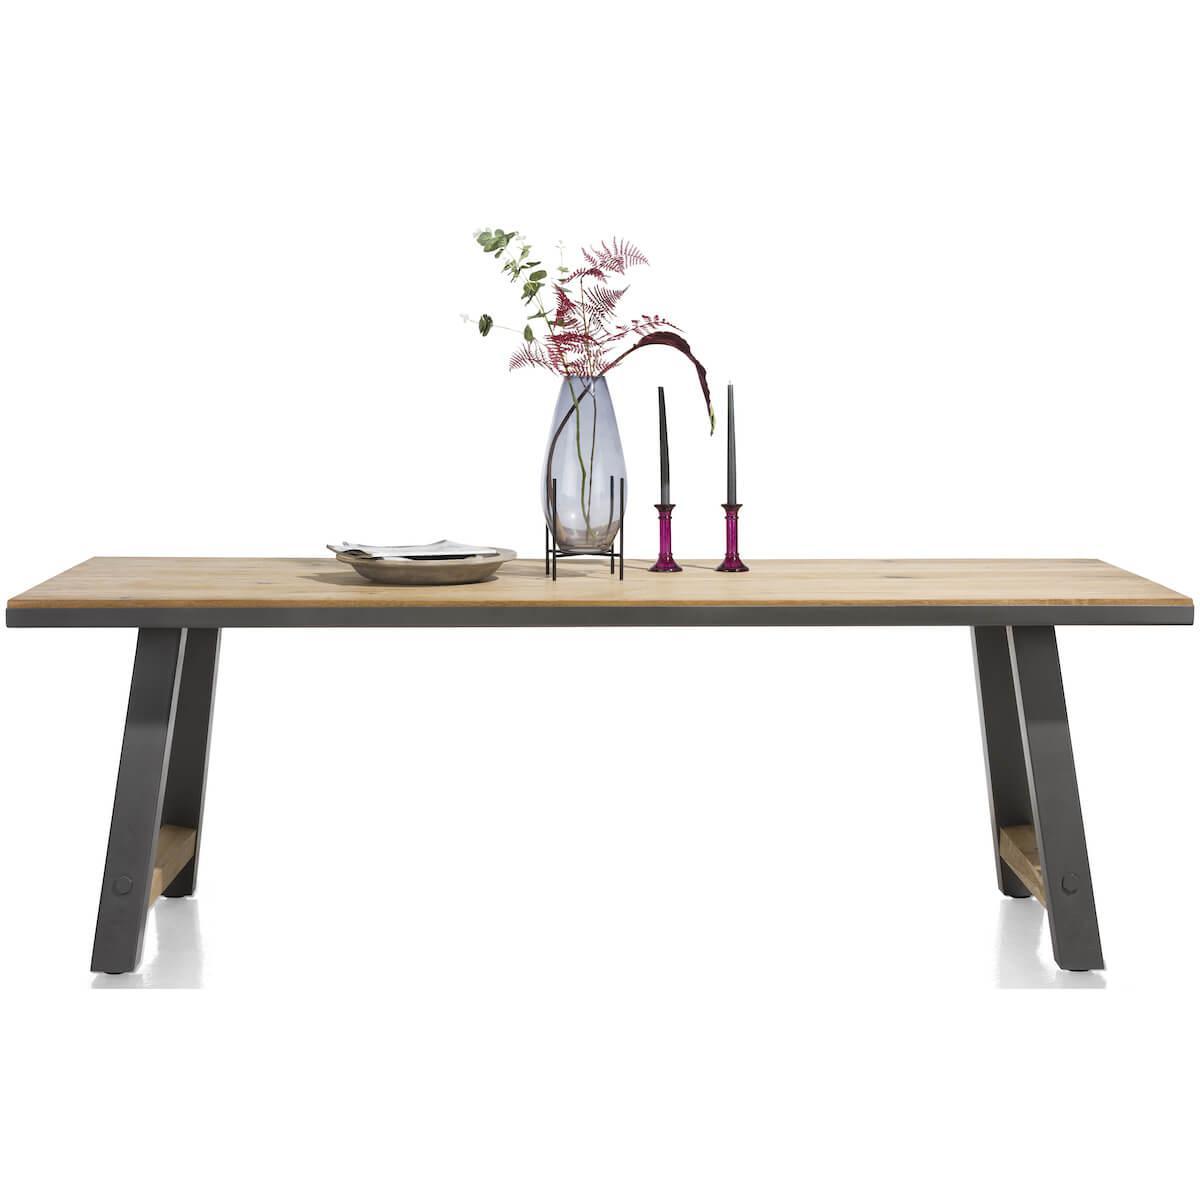 Table 240cm FARMLAND Henders & Hazel